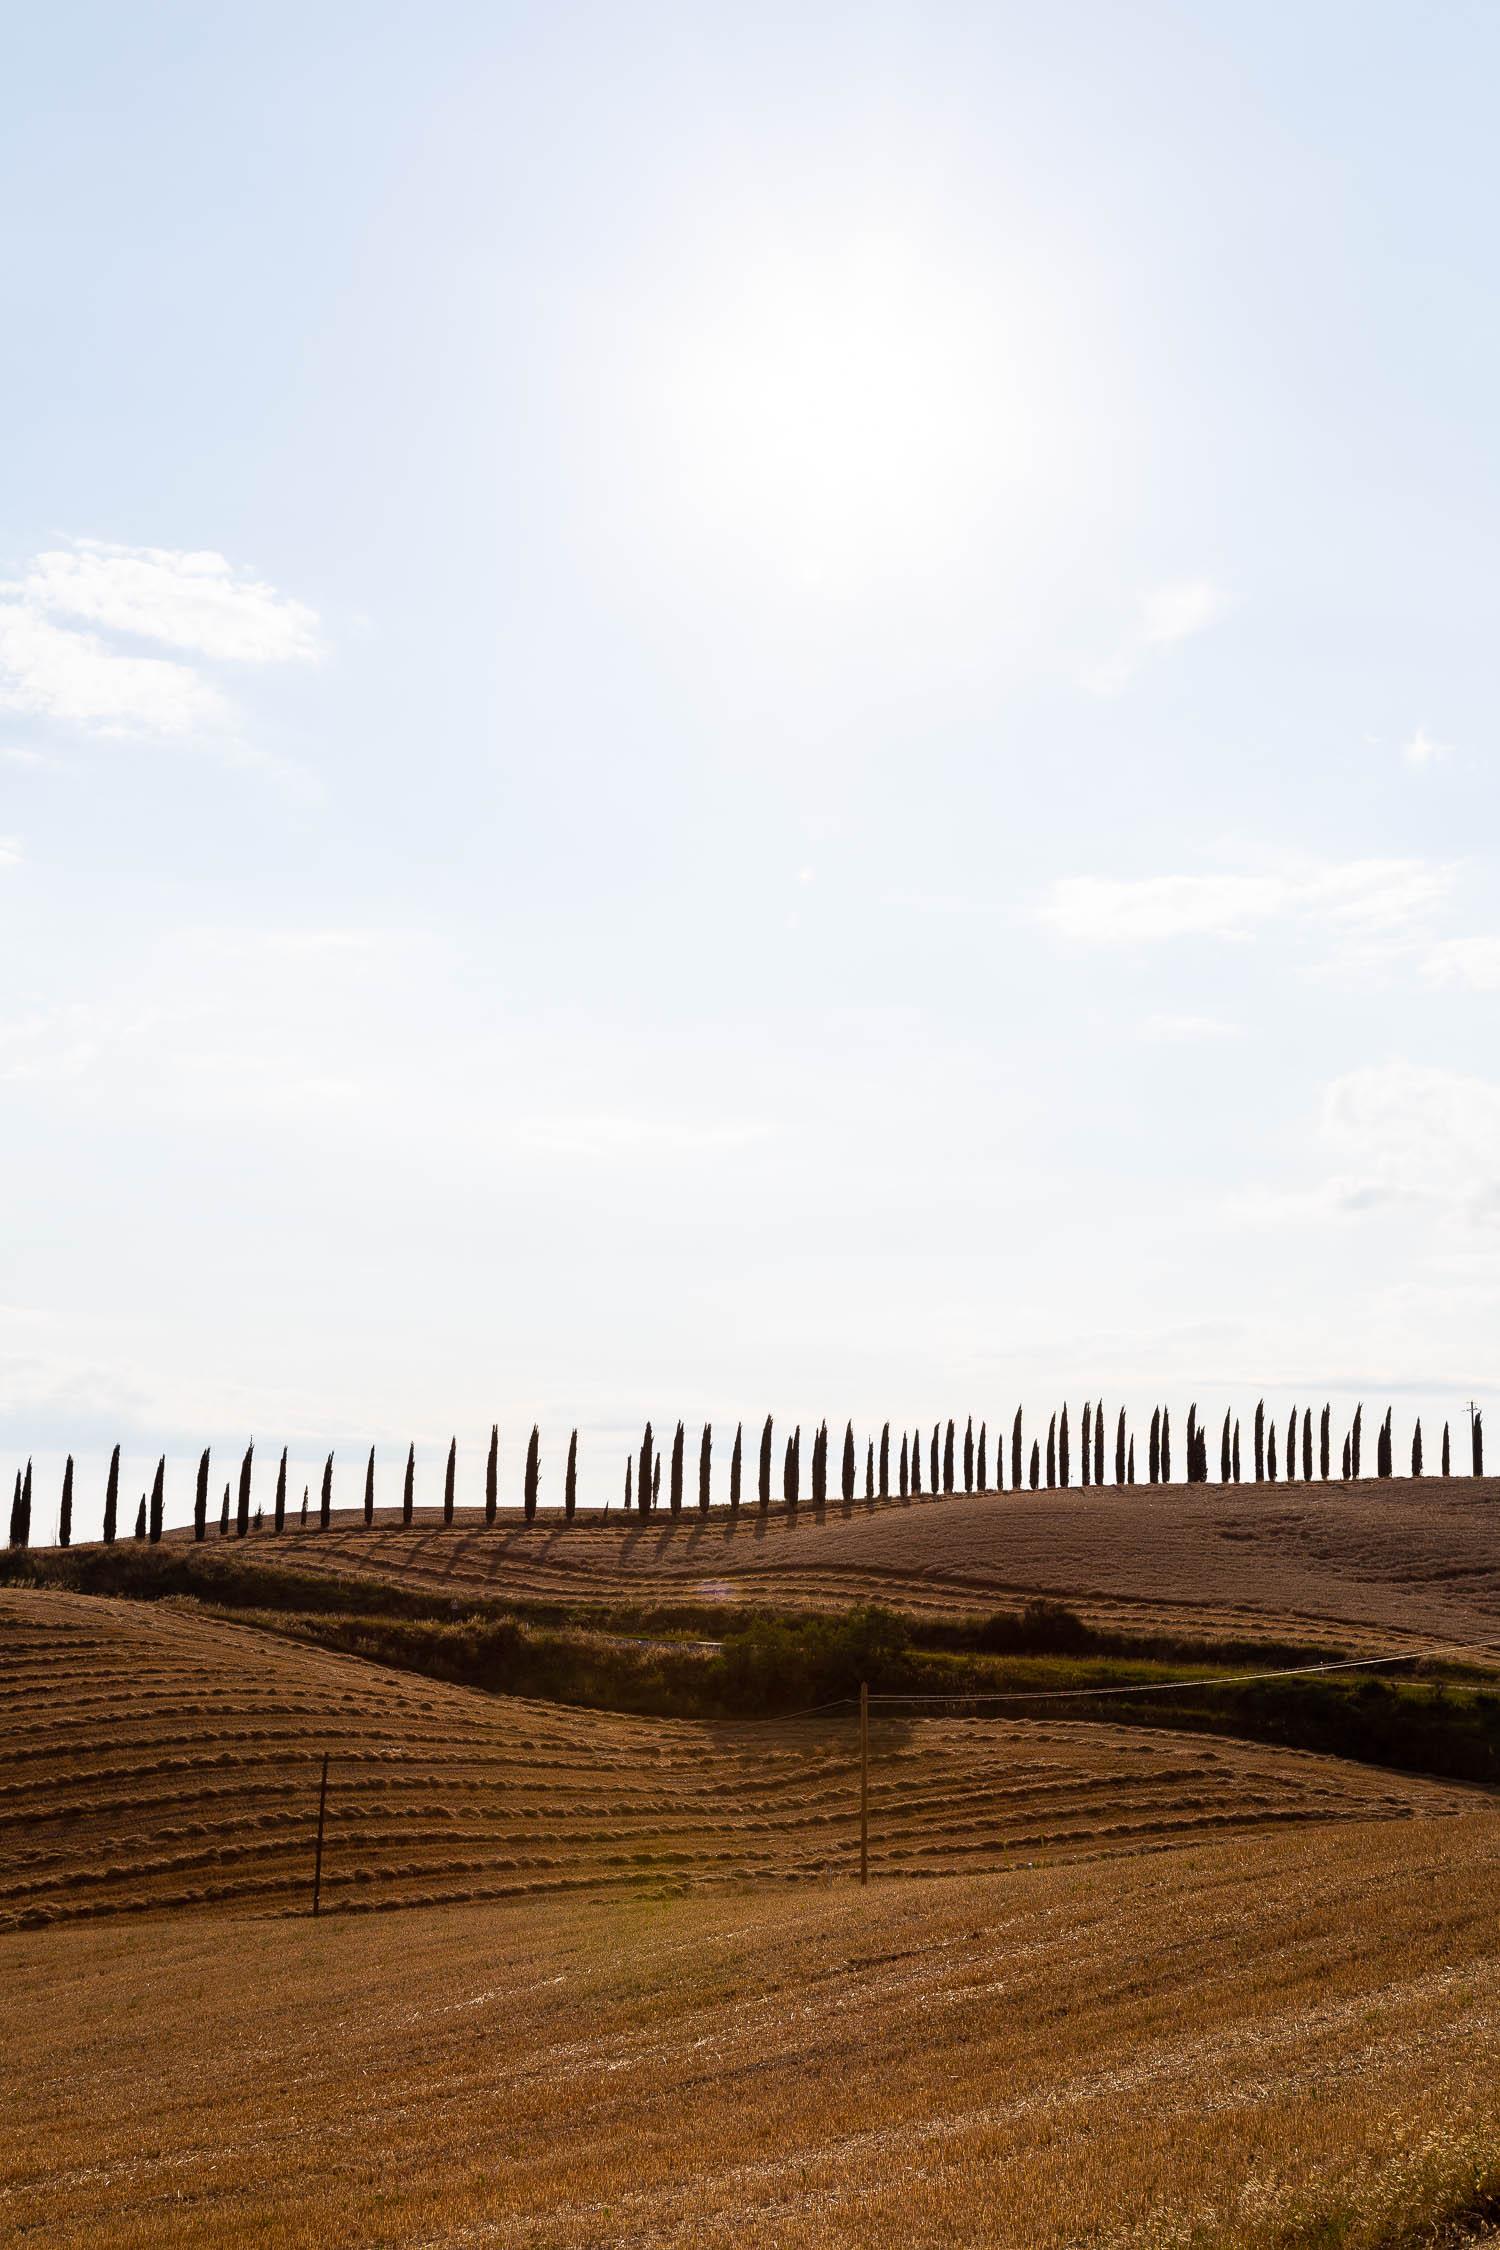 Tuscany-cypresses-on-the-horizon-5291.jpg